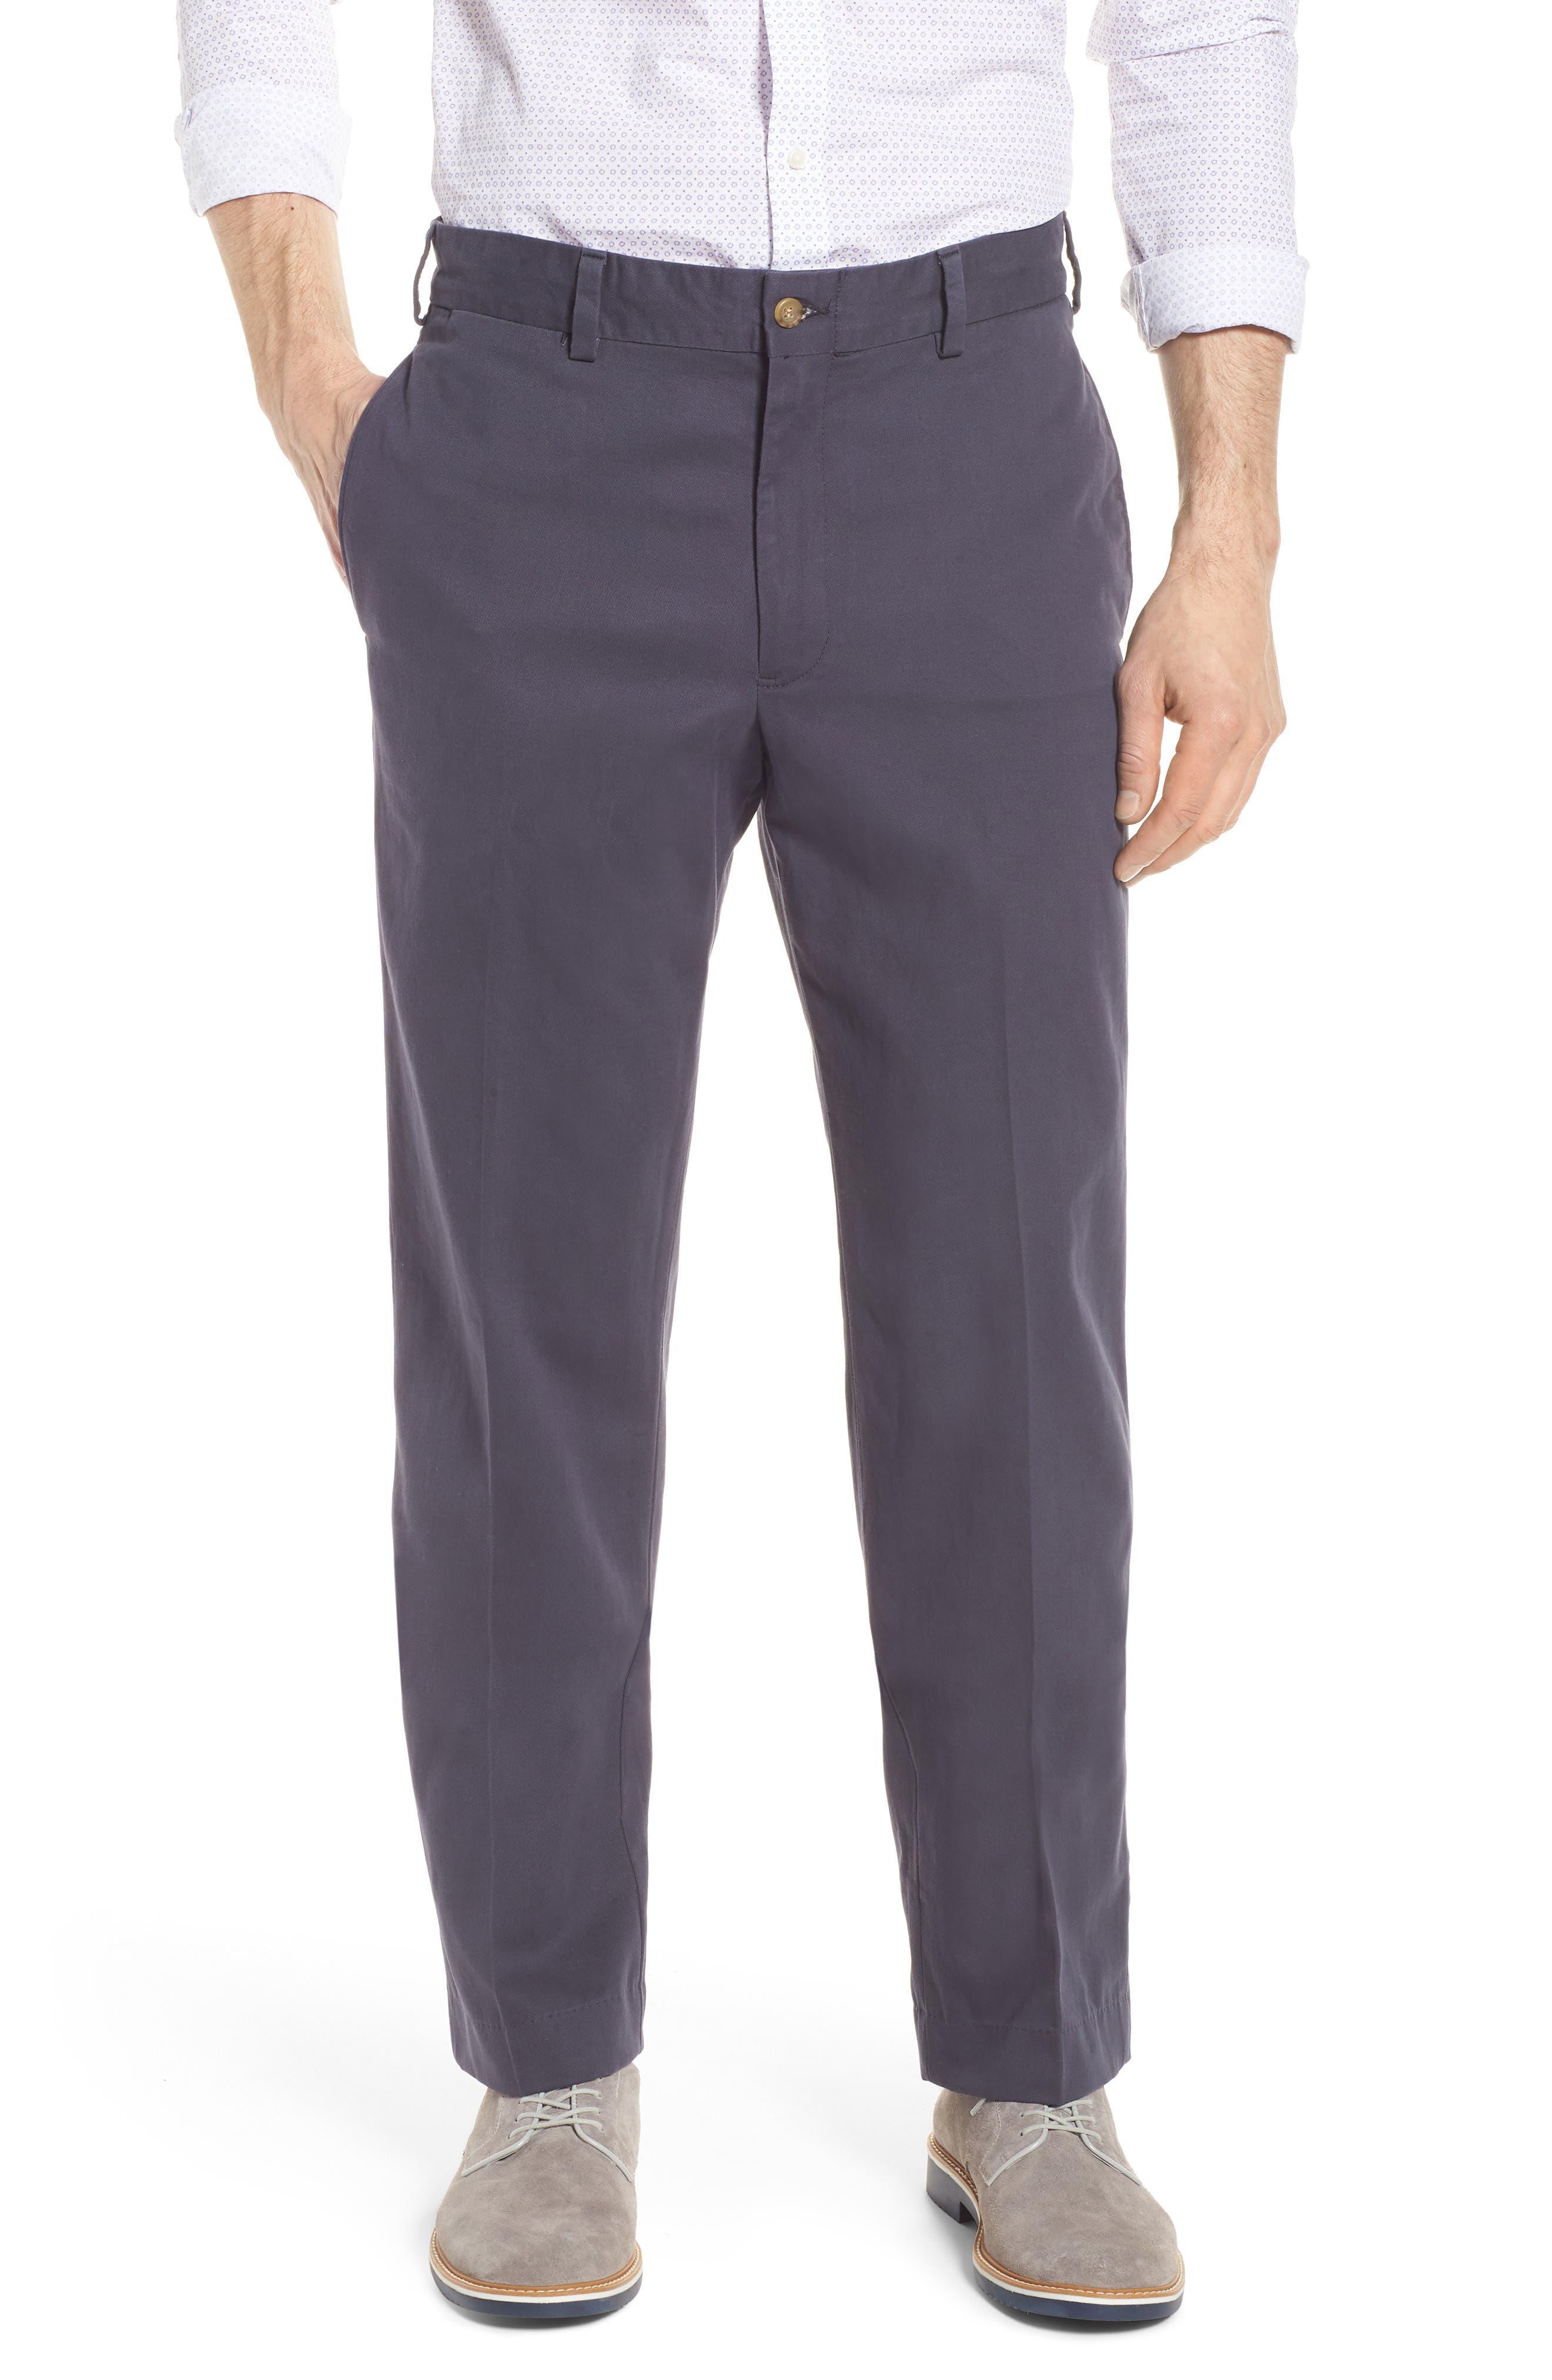 M2 Classic Fit Flat Front Vintage Twill Pants,                             Main thumbnail 1, color,                             410